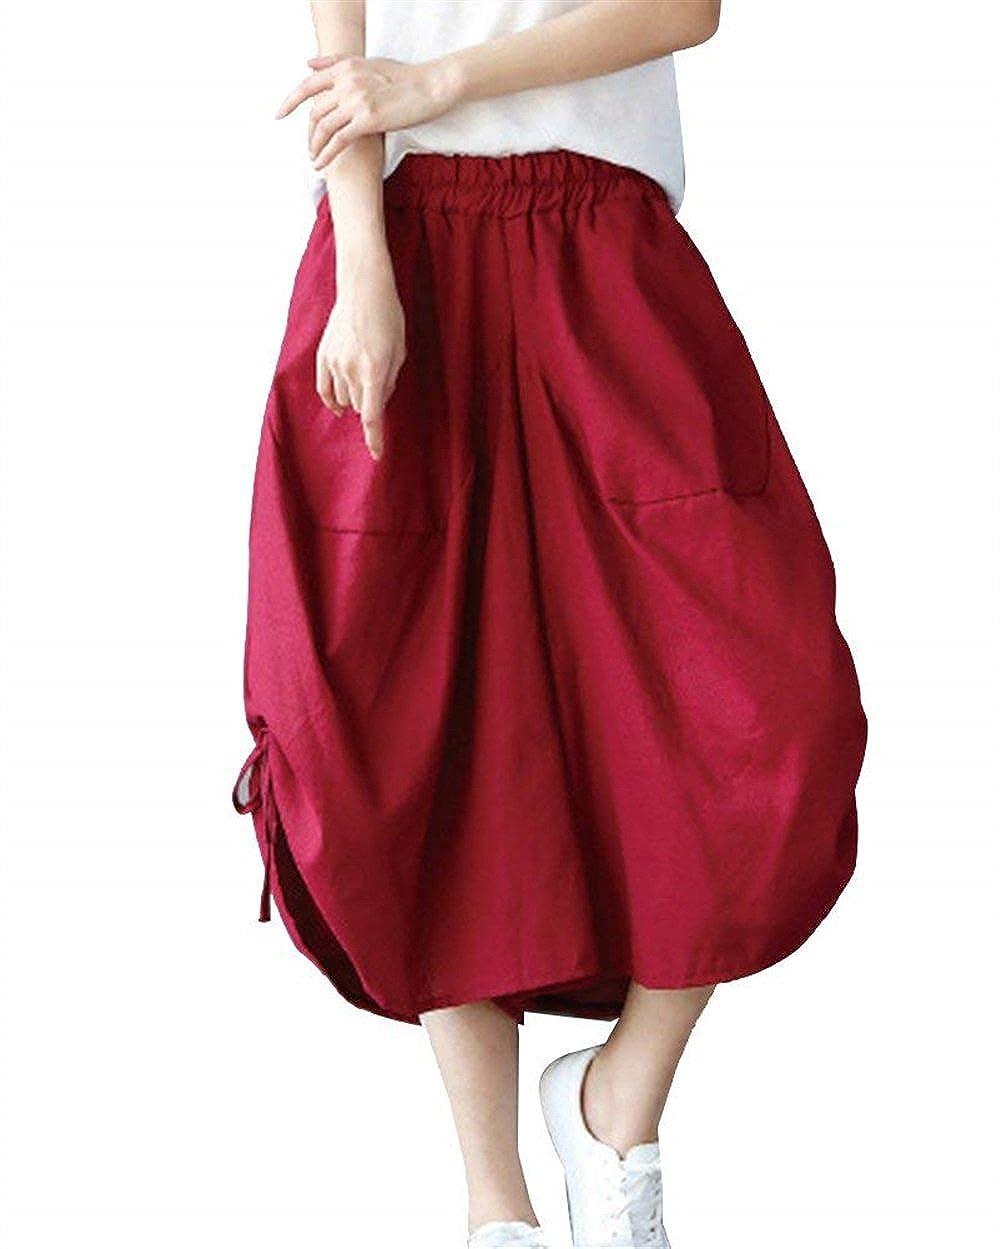 Mujer Pantalon Pirata Mujer Elegante Verano Pantalones Harem ...